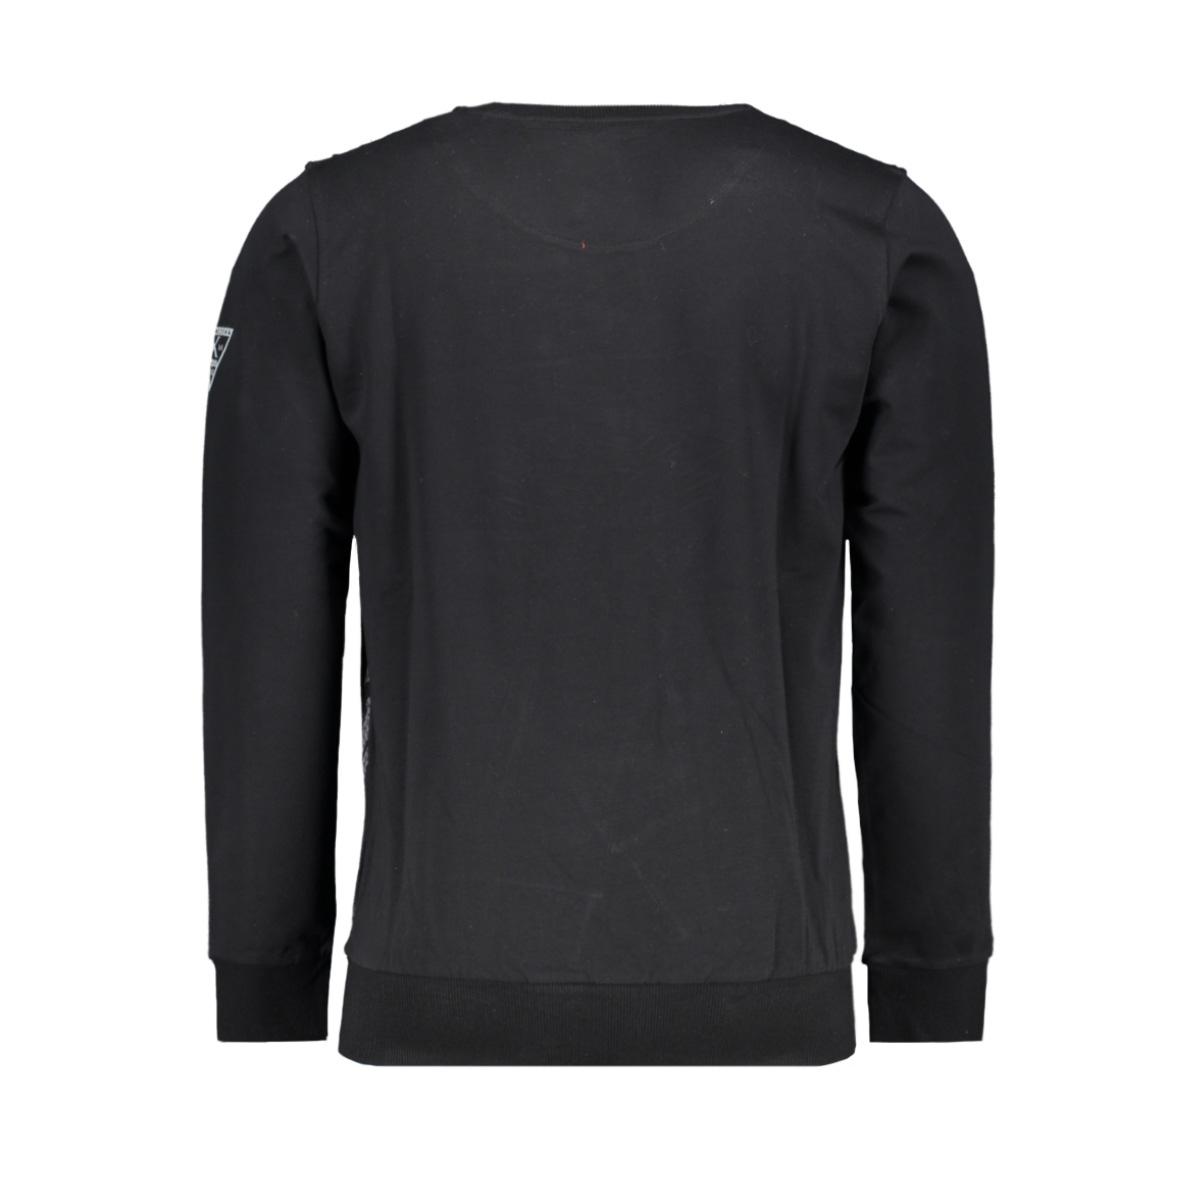 76105 gabbiano sweater black